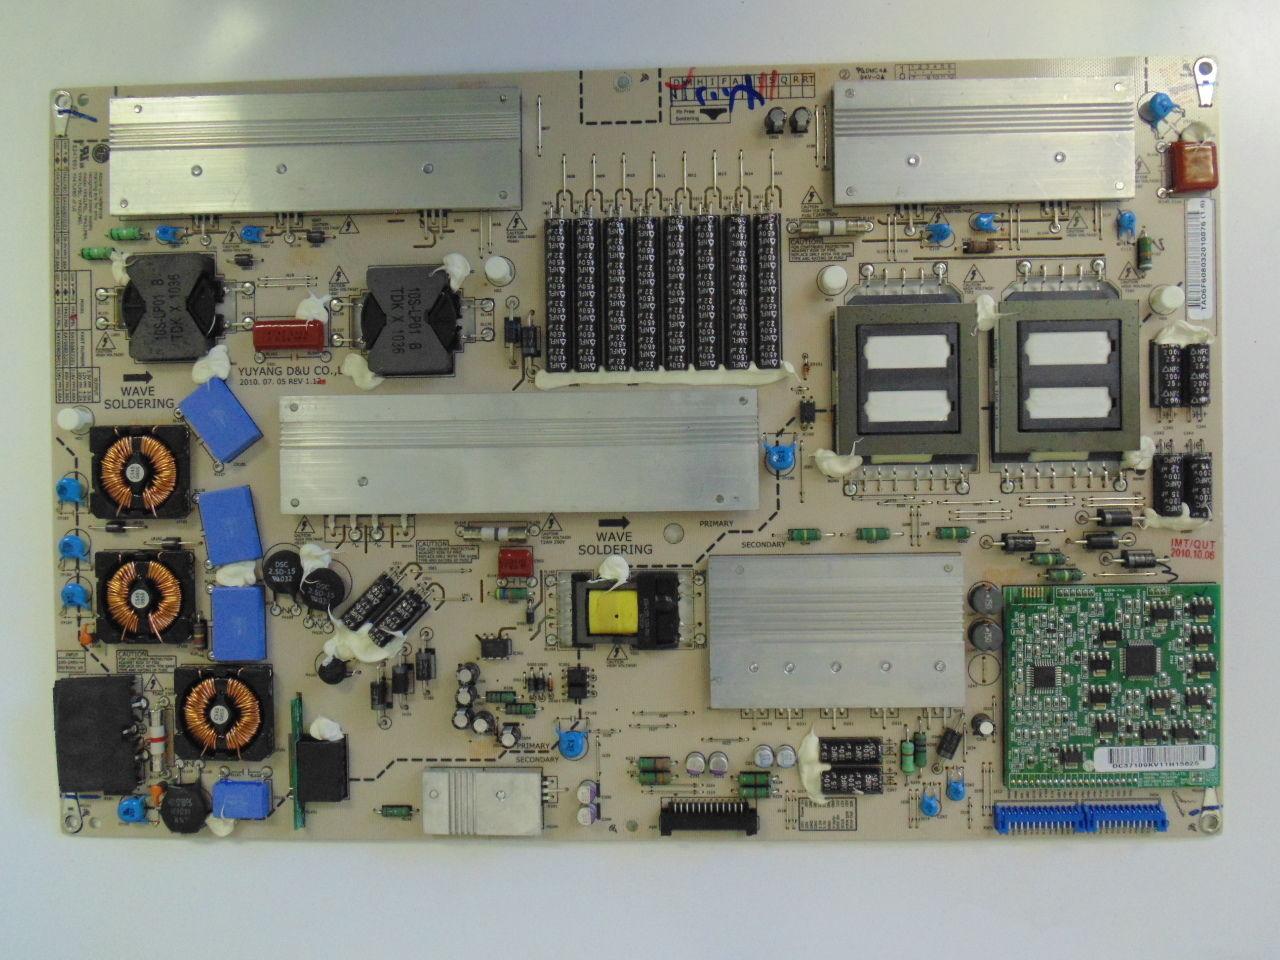 Lg 42le5500 Power Supply Schematic 4 Leg Led Wiring Diagram